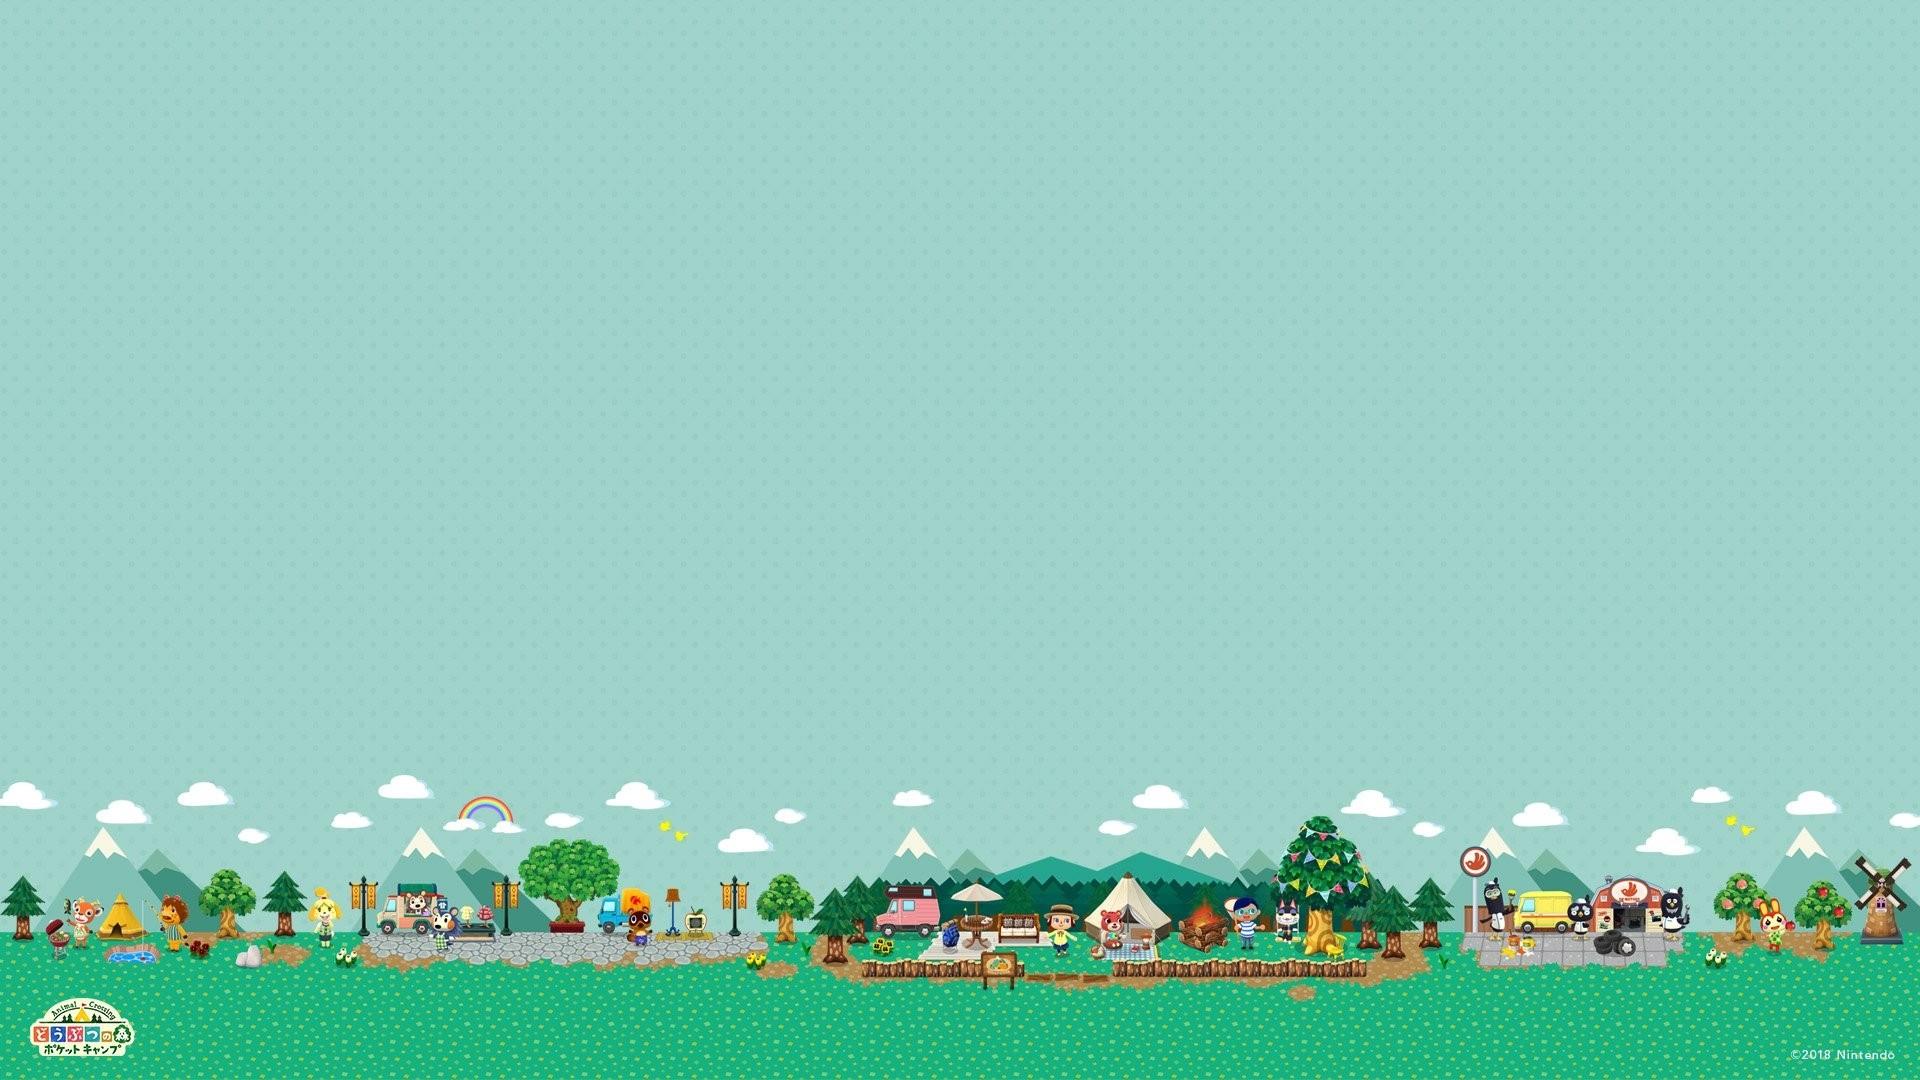 Animal Crossing HD Wallpaper